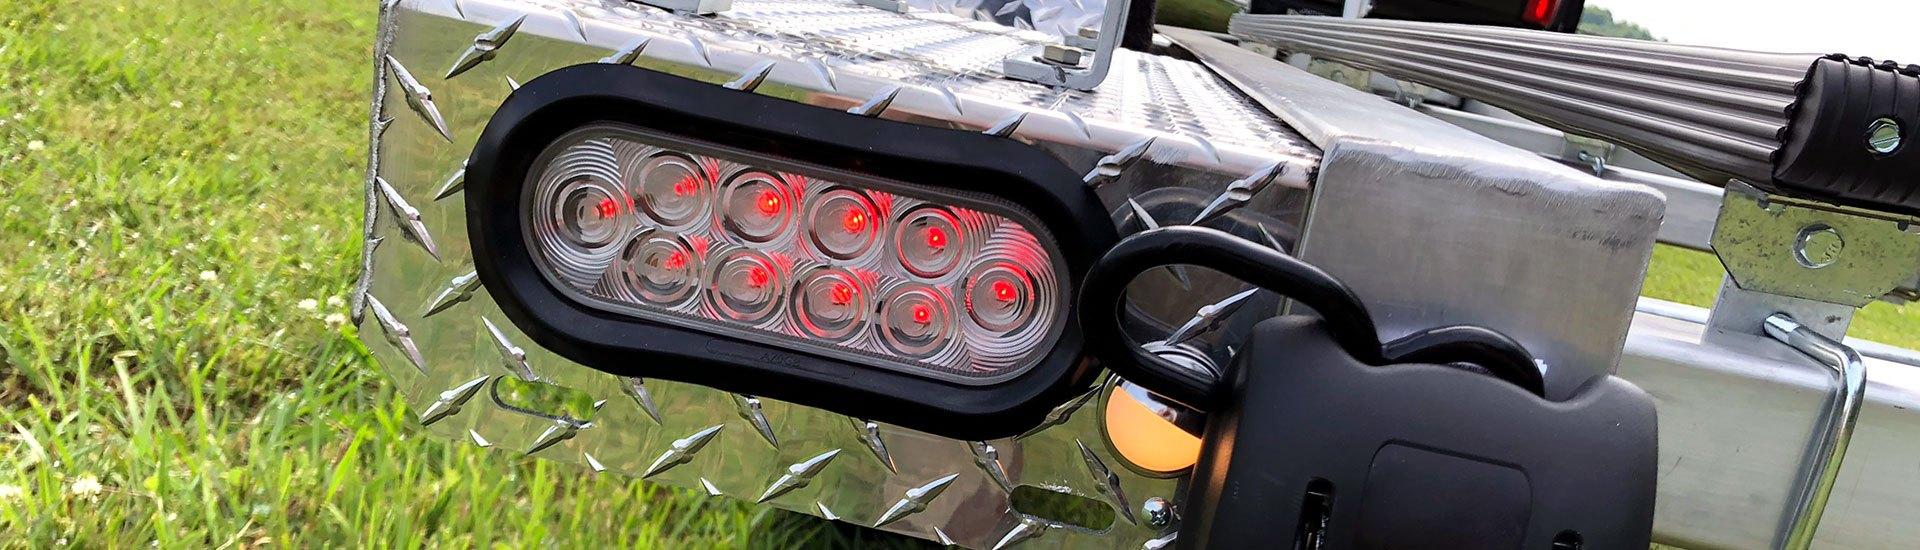 trailer backup light wiring trailer lights led  waterproof  submersible  complete kits  trailer lights led  waterproof